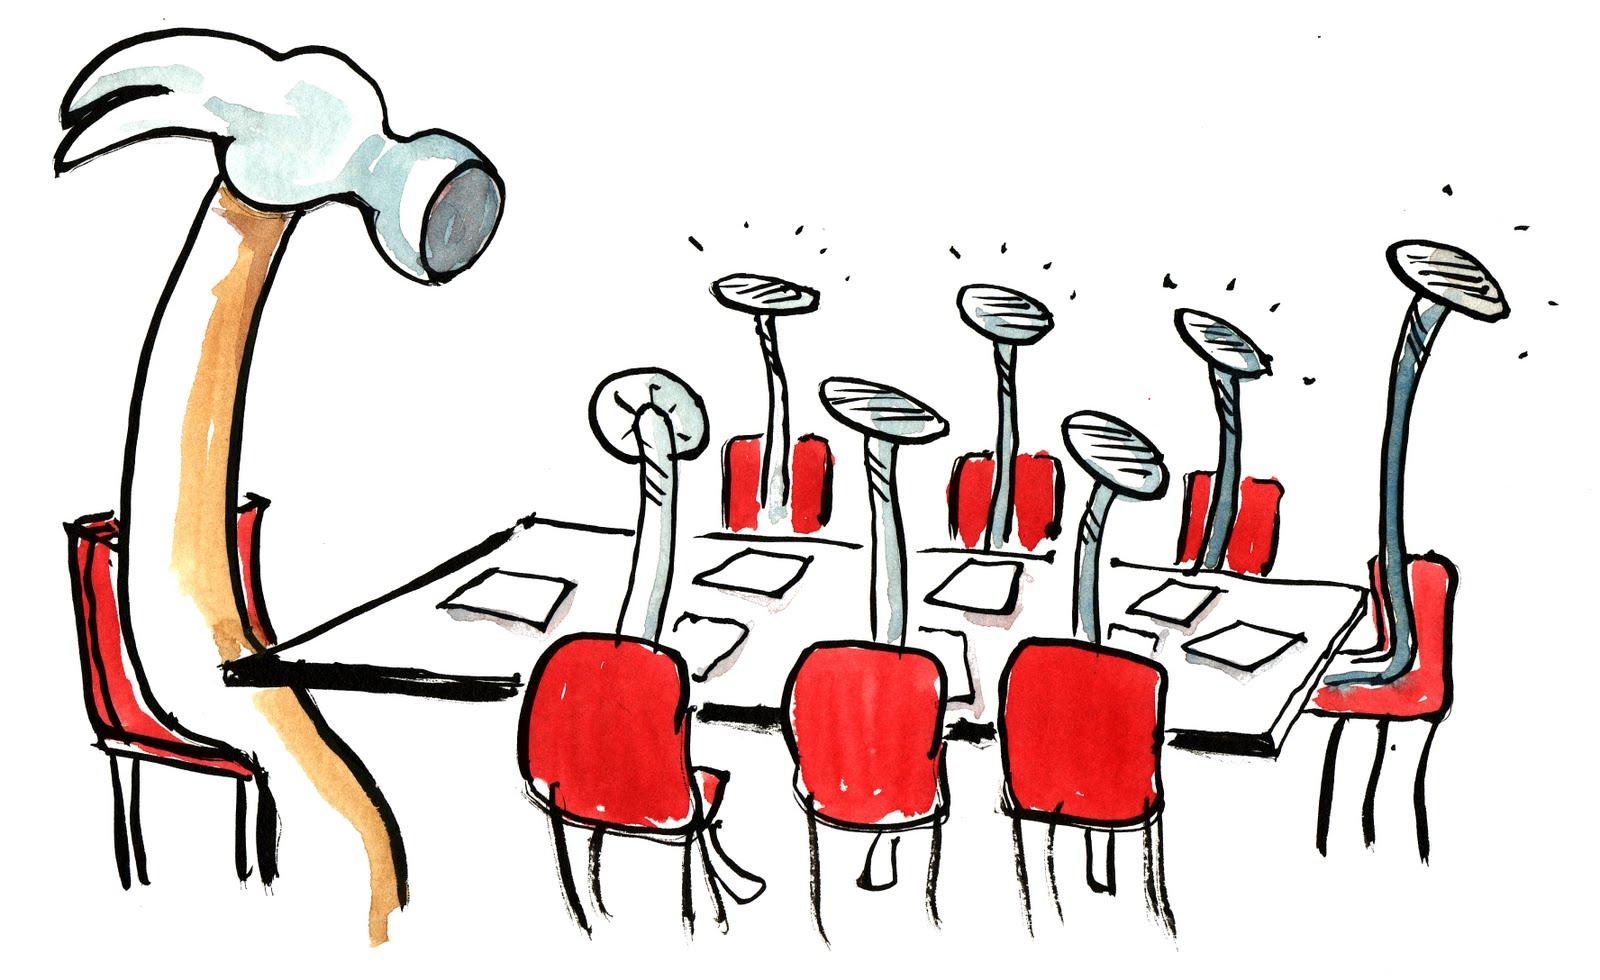 employee meeting clipart - photo #13